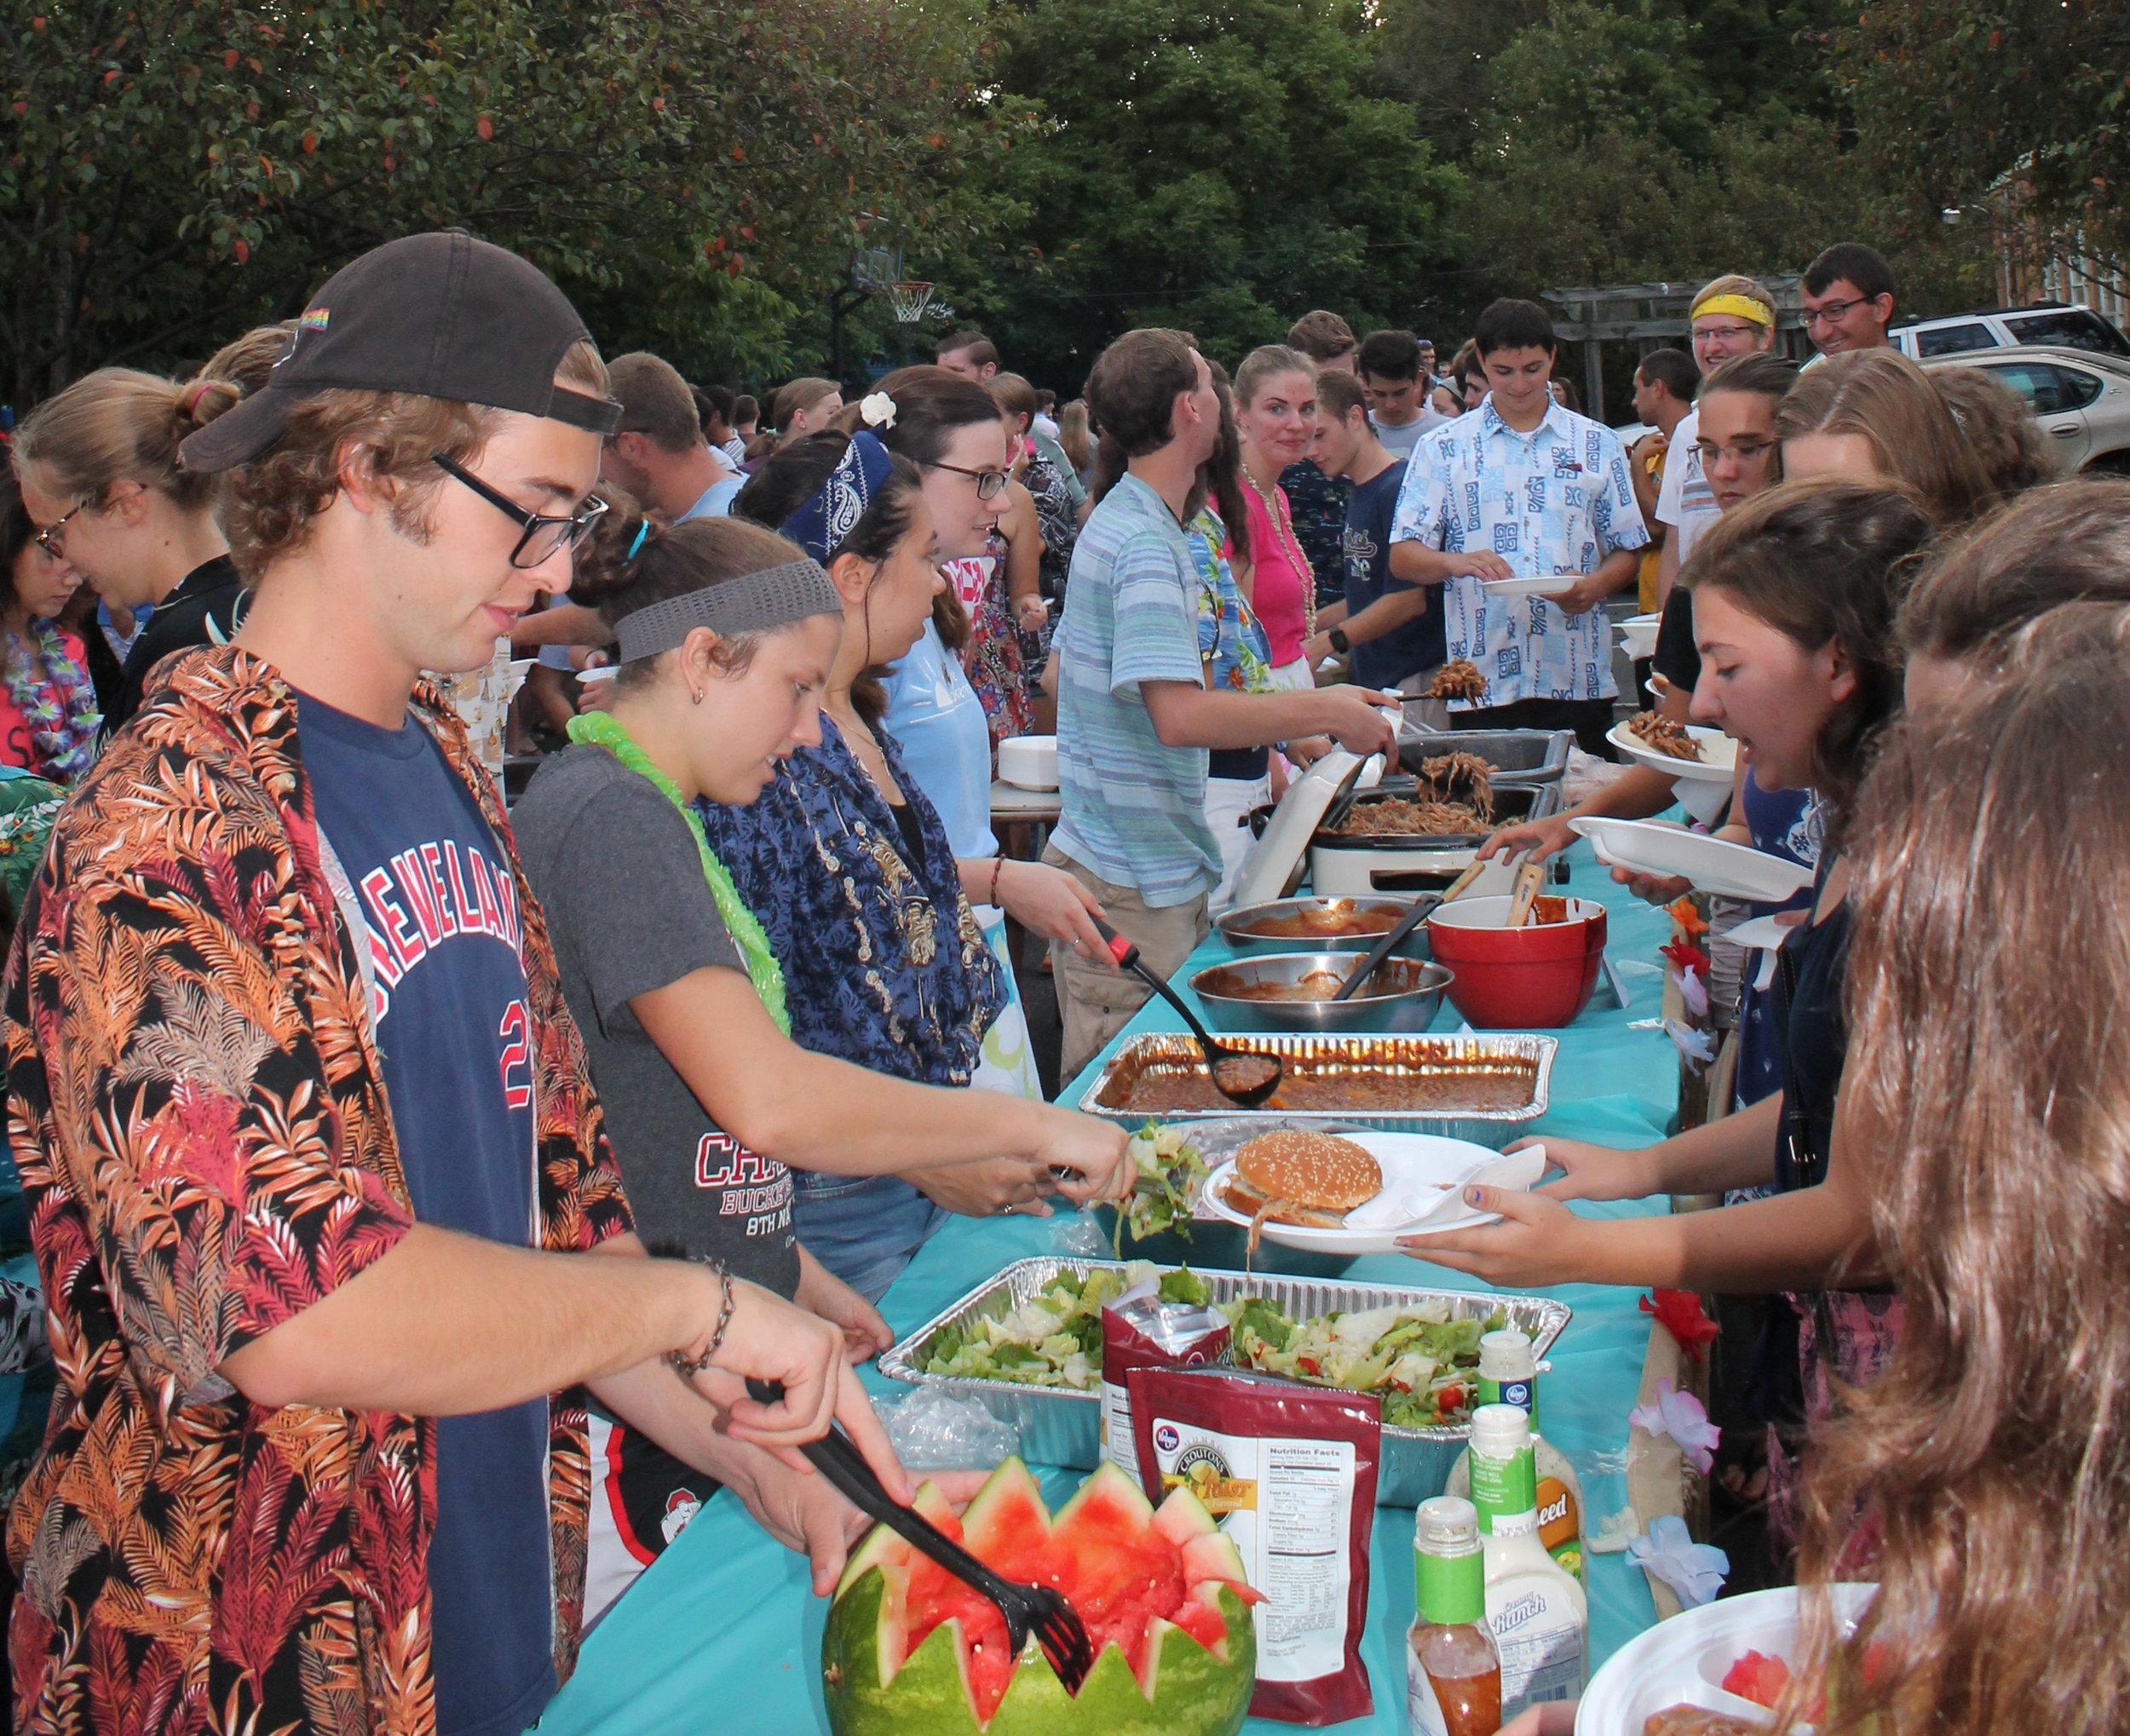 Jacob Ritchey (far left) helps serve food at SPO's annual Hog Roast.